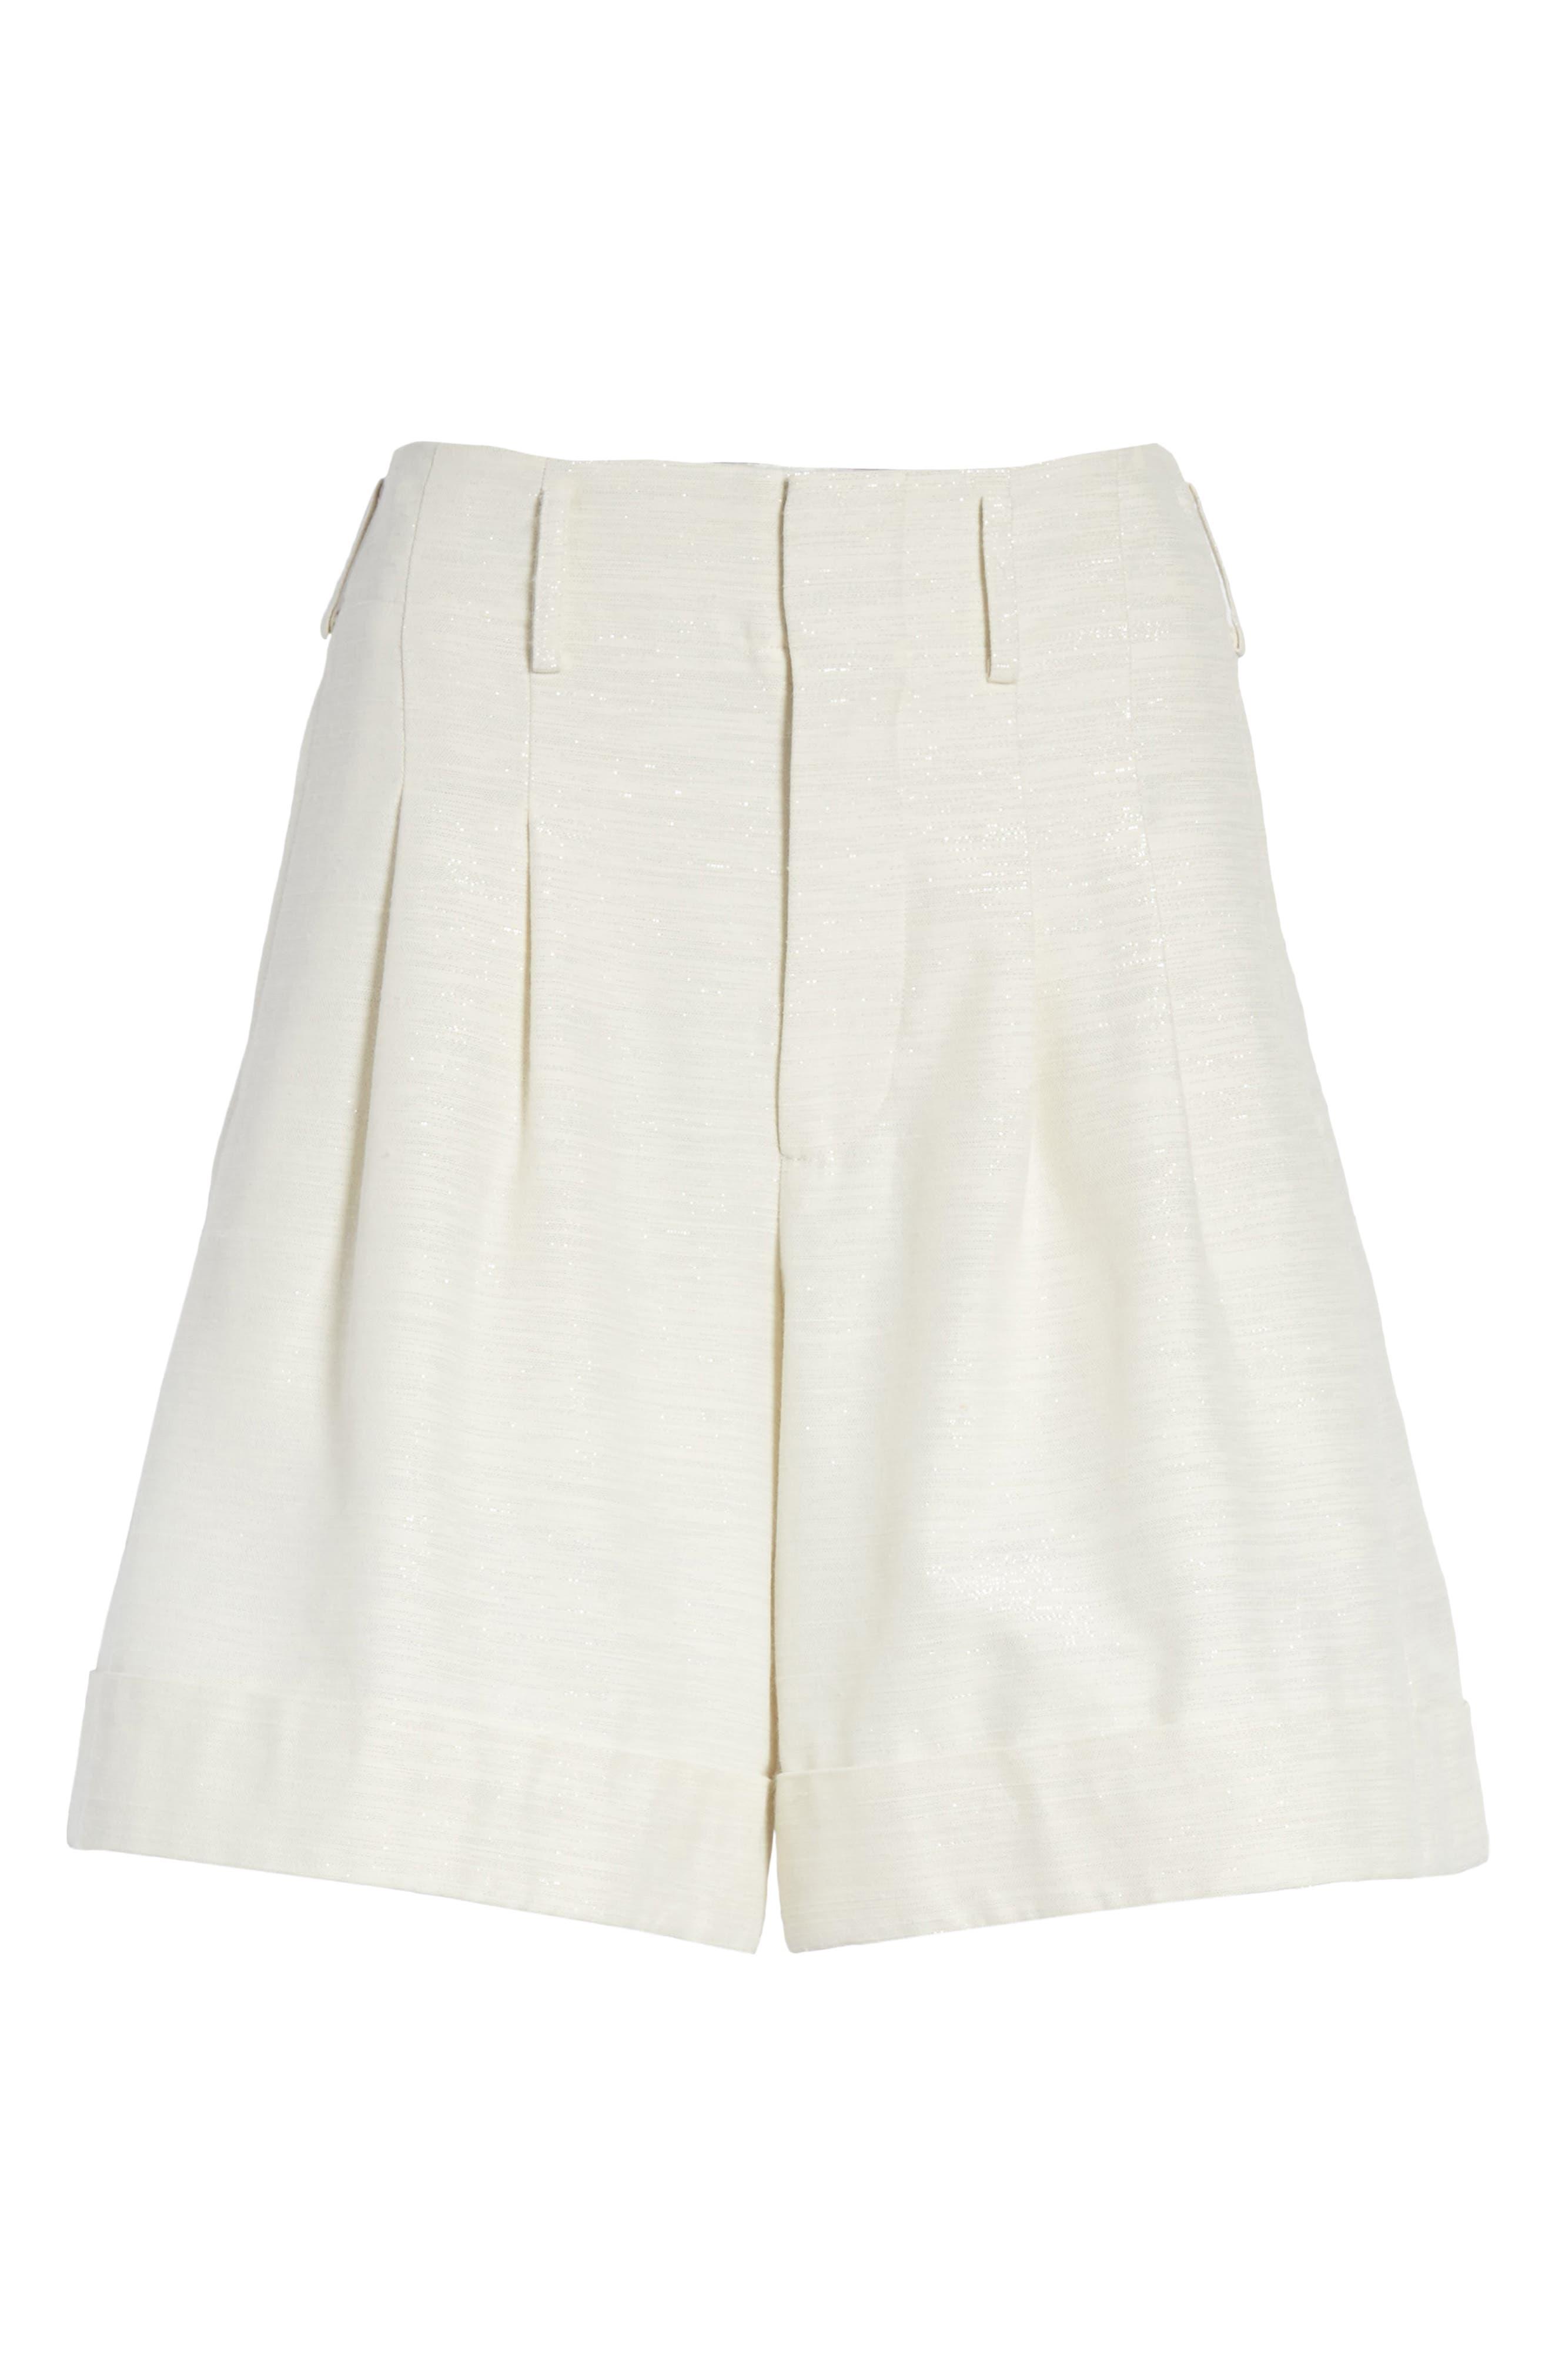 Sparkle Woven Wide Leg Shorts,                             Alternate thumbnail 6, color,                             Ivory